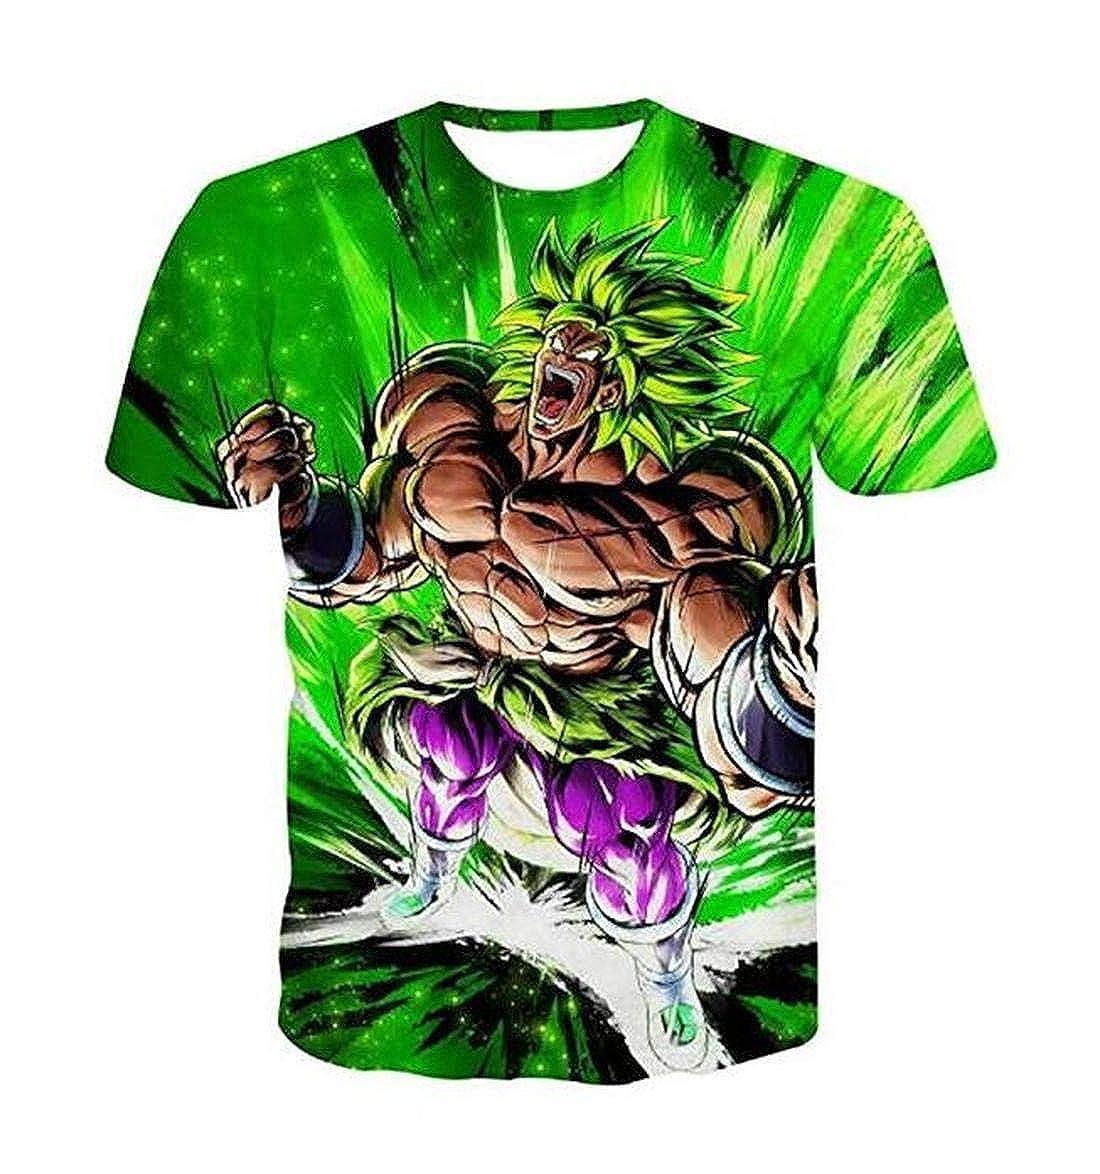 Anime ONE Piece Luffy Print Casual 3D T-Shirt Dragon Ball Z Short Sleeve Tee Tops /& KID1-4XL